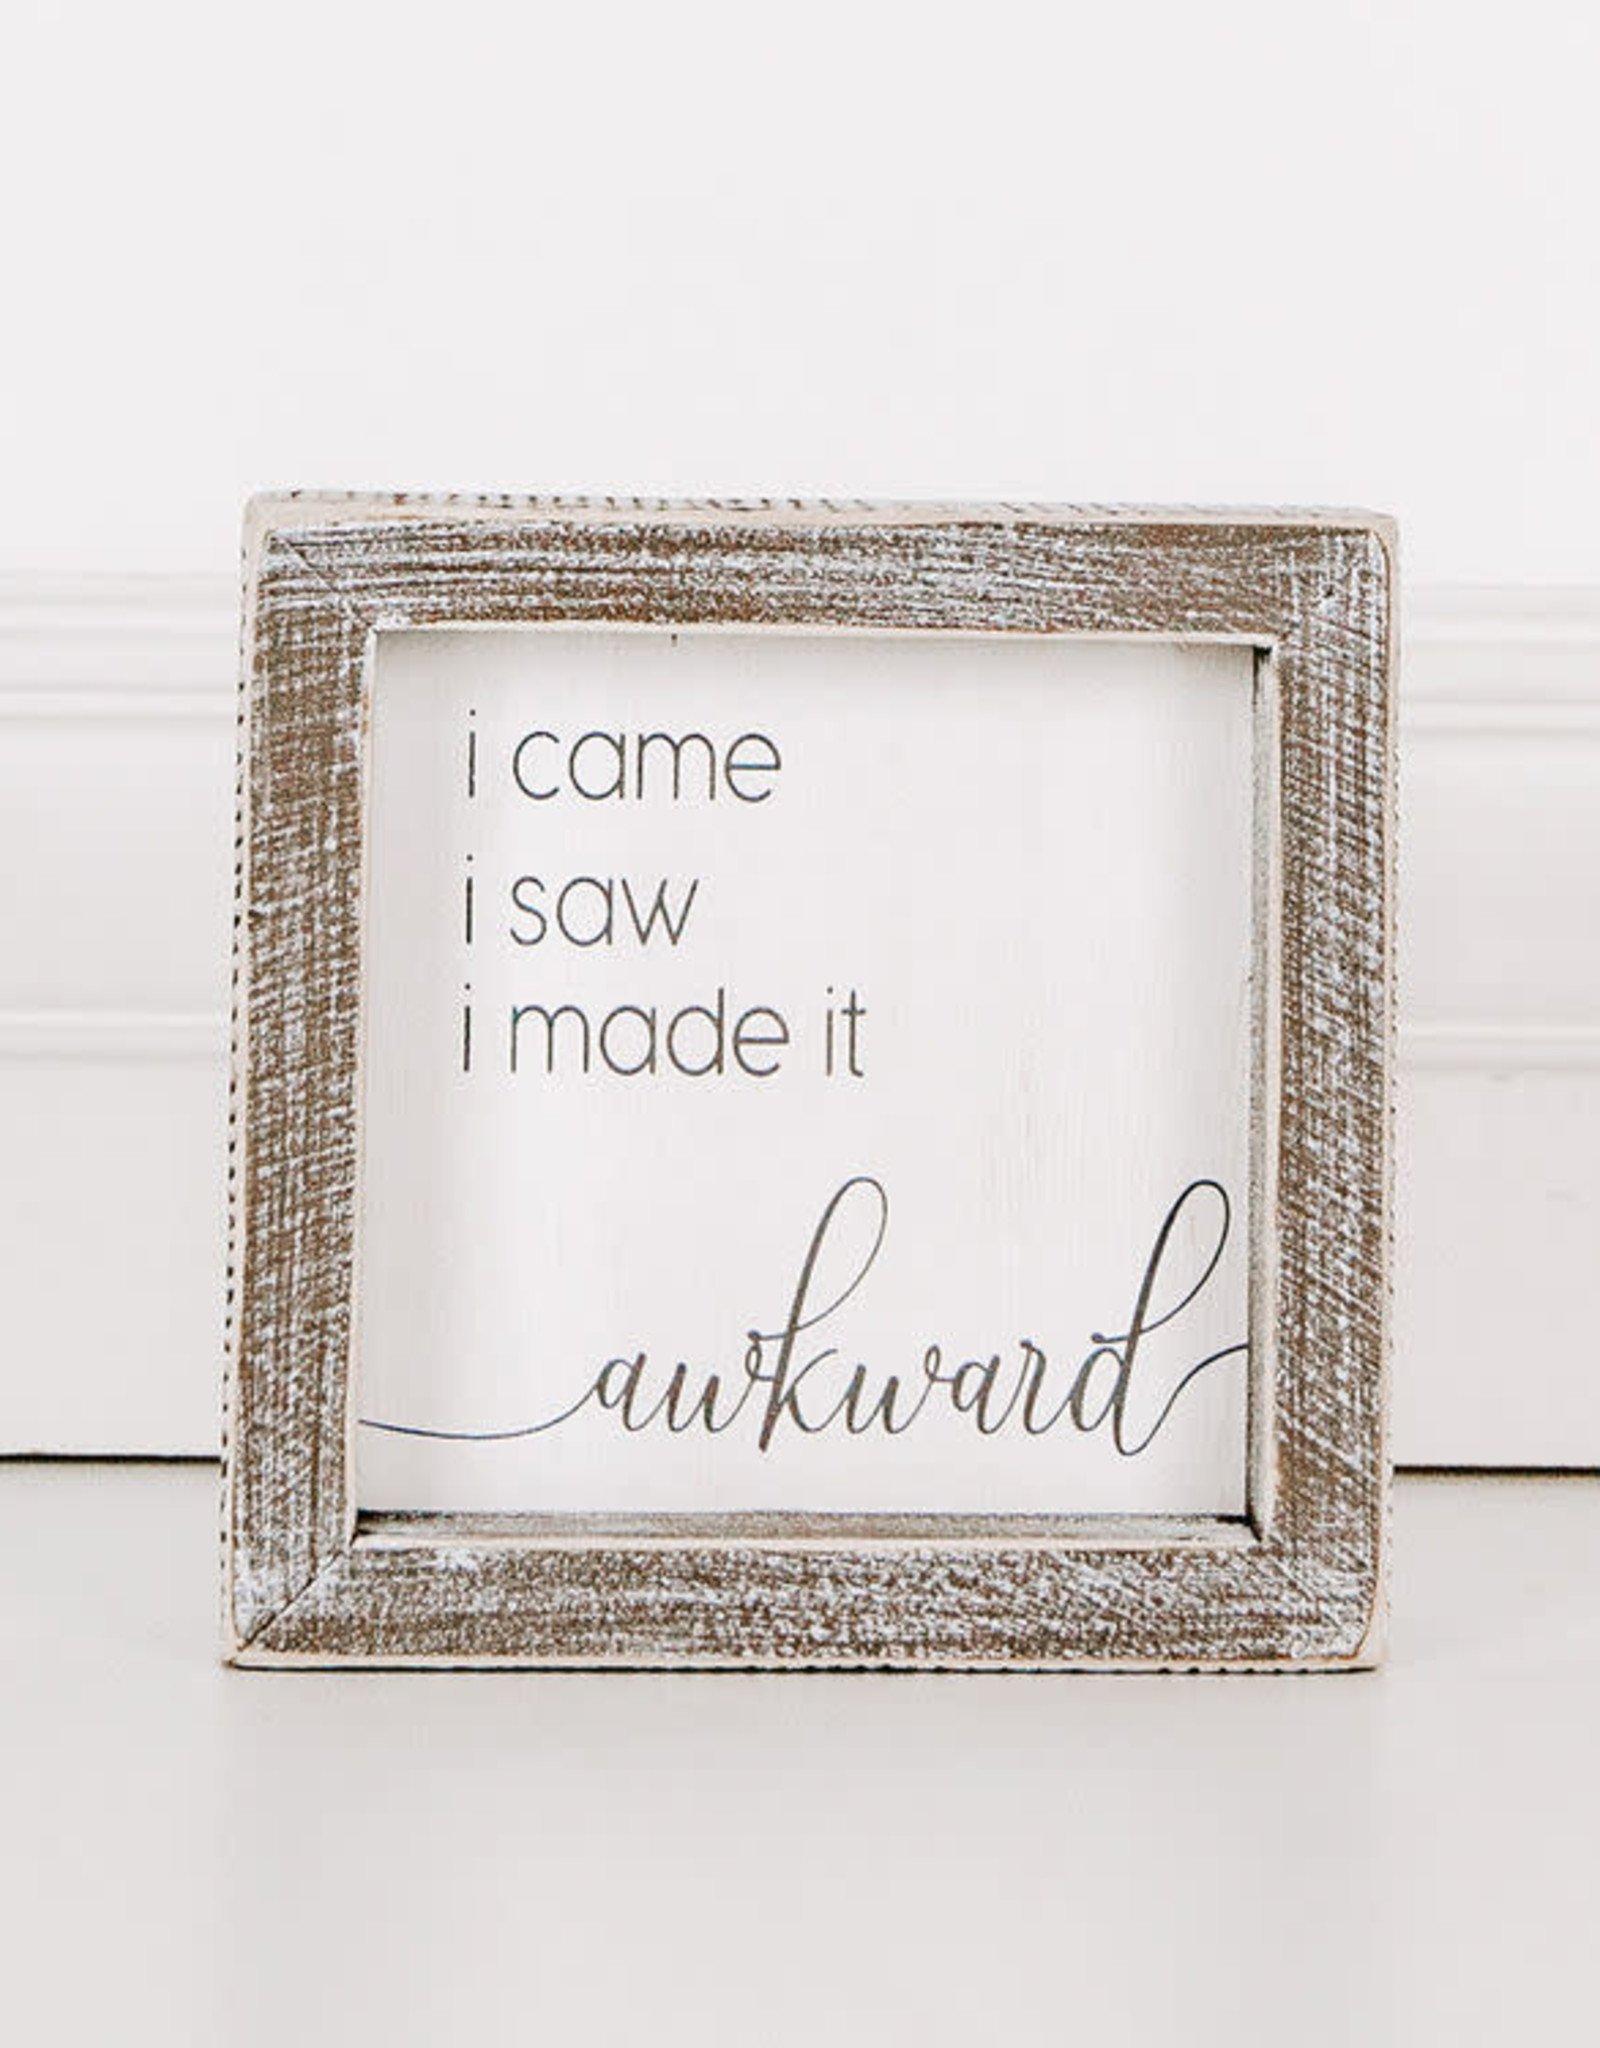 Adams & Co I Came I Saw I Made it Akward Sign